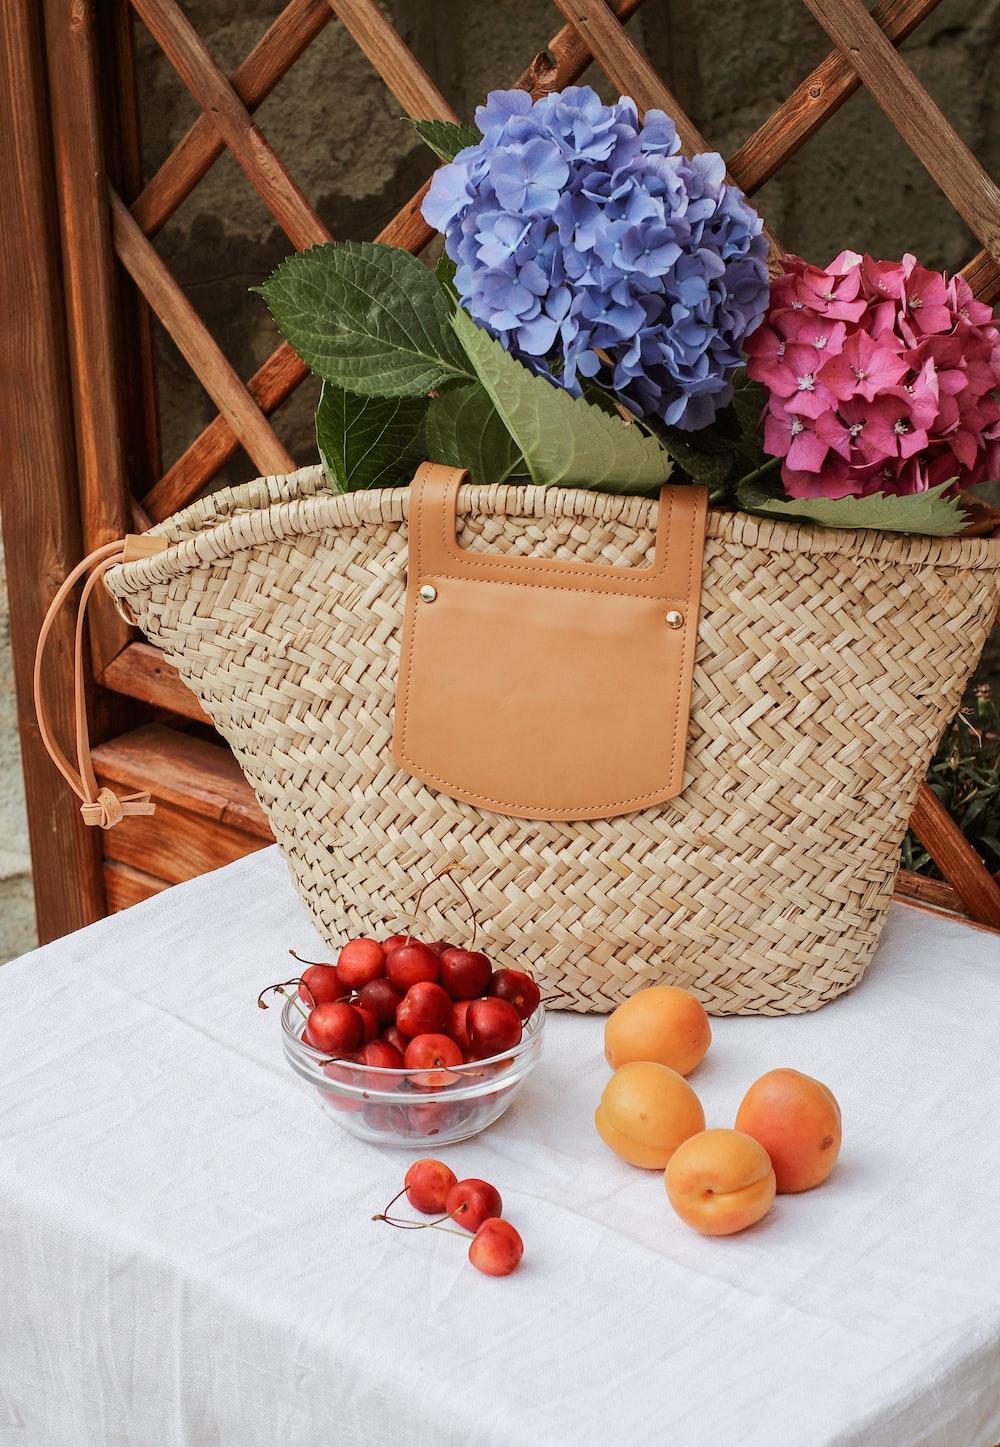 orange fruits on brown woven basket